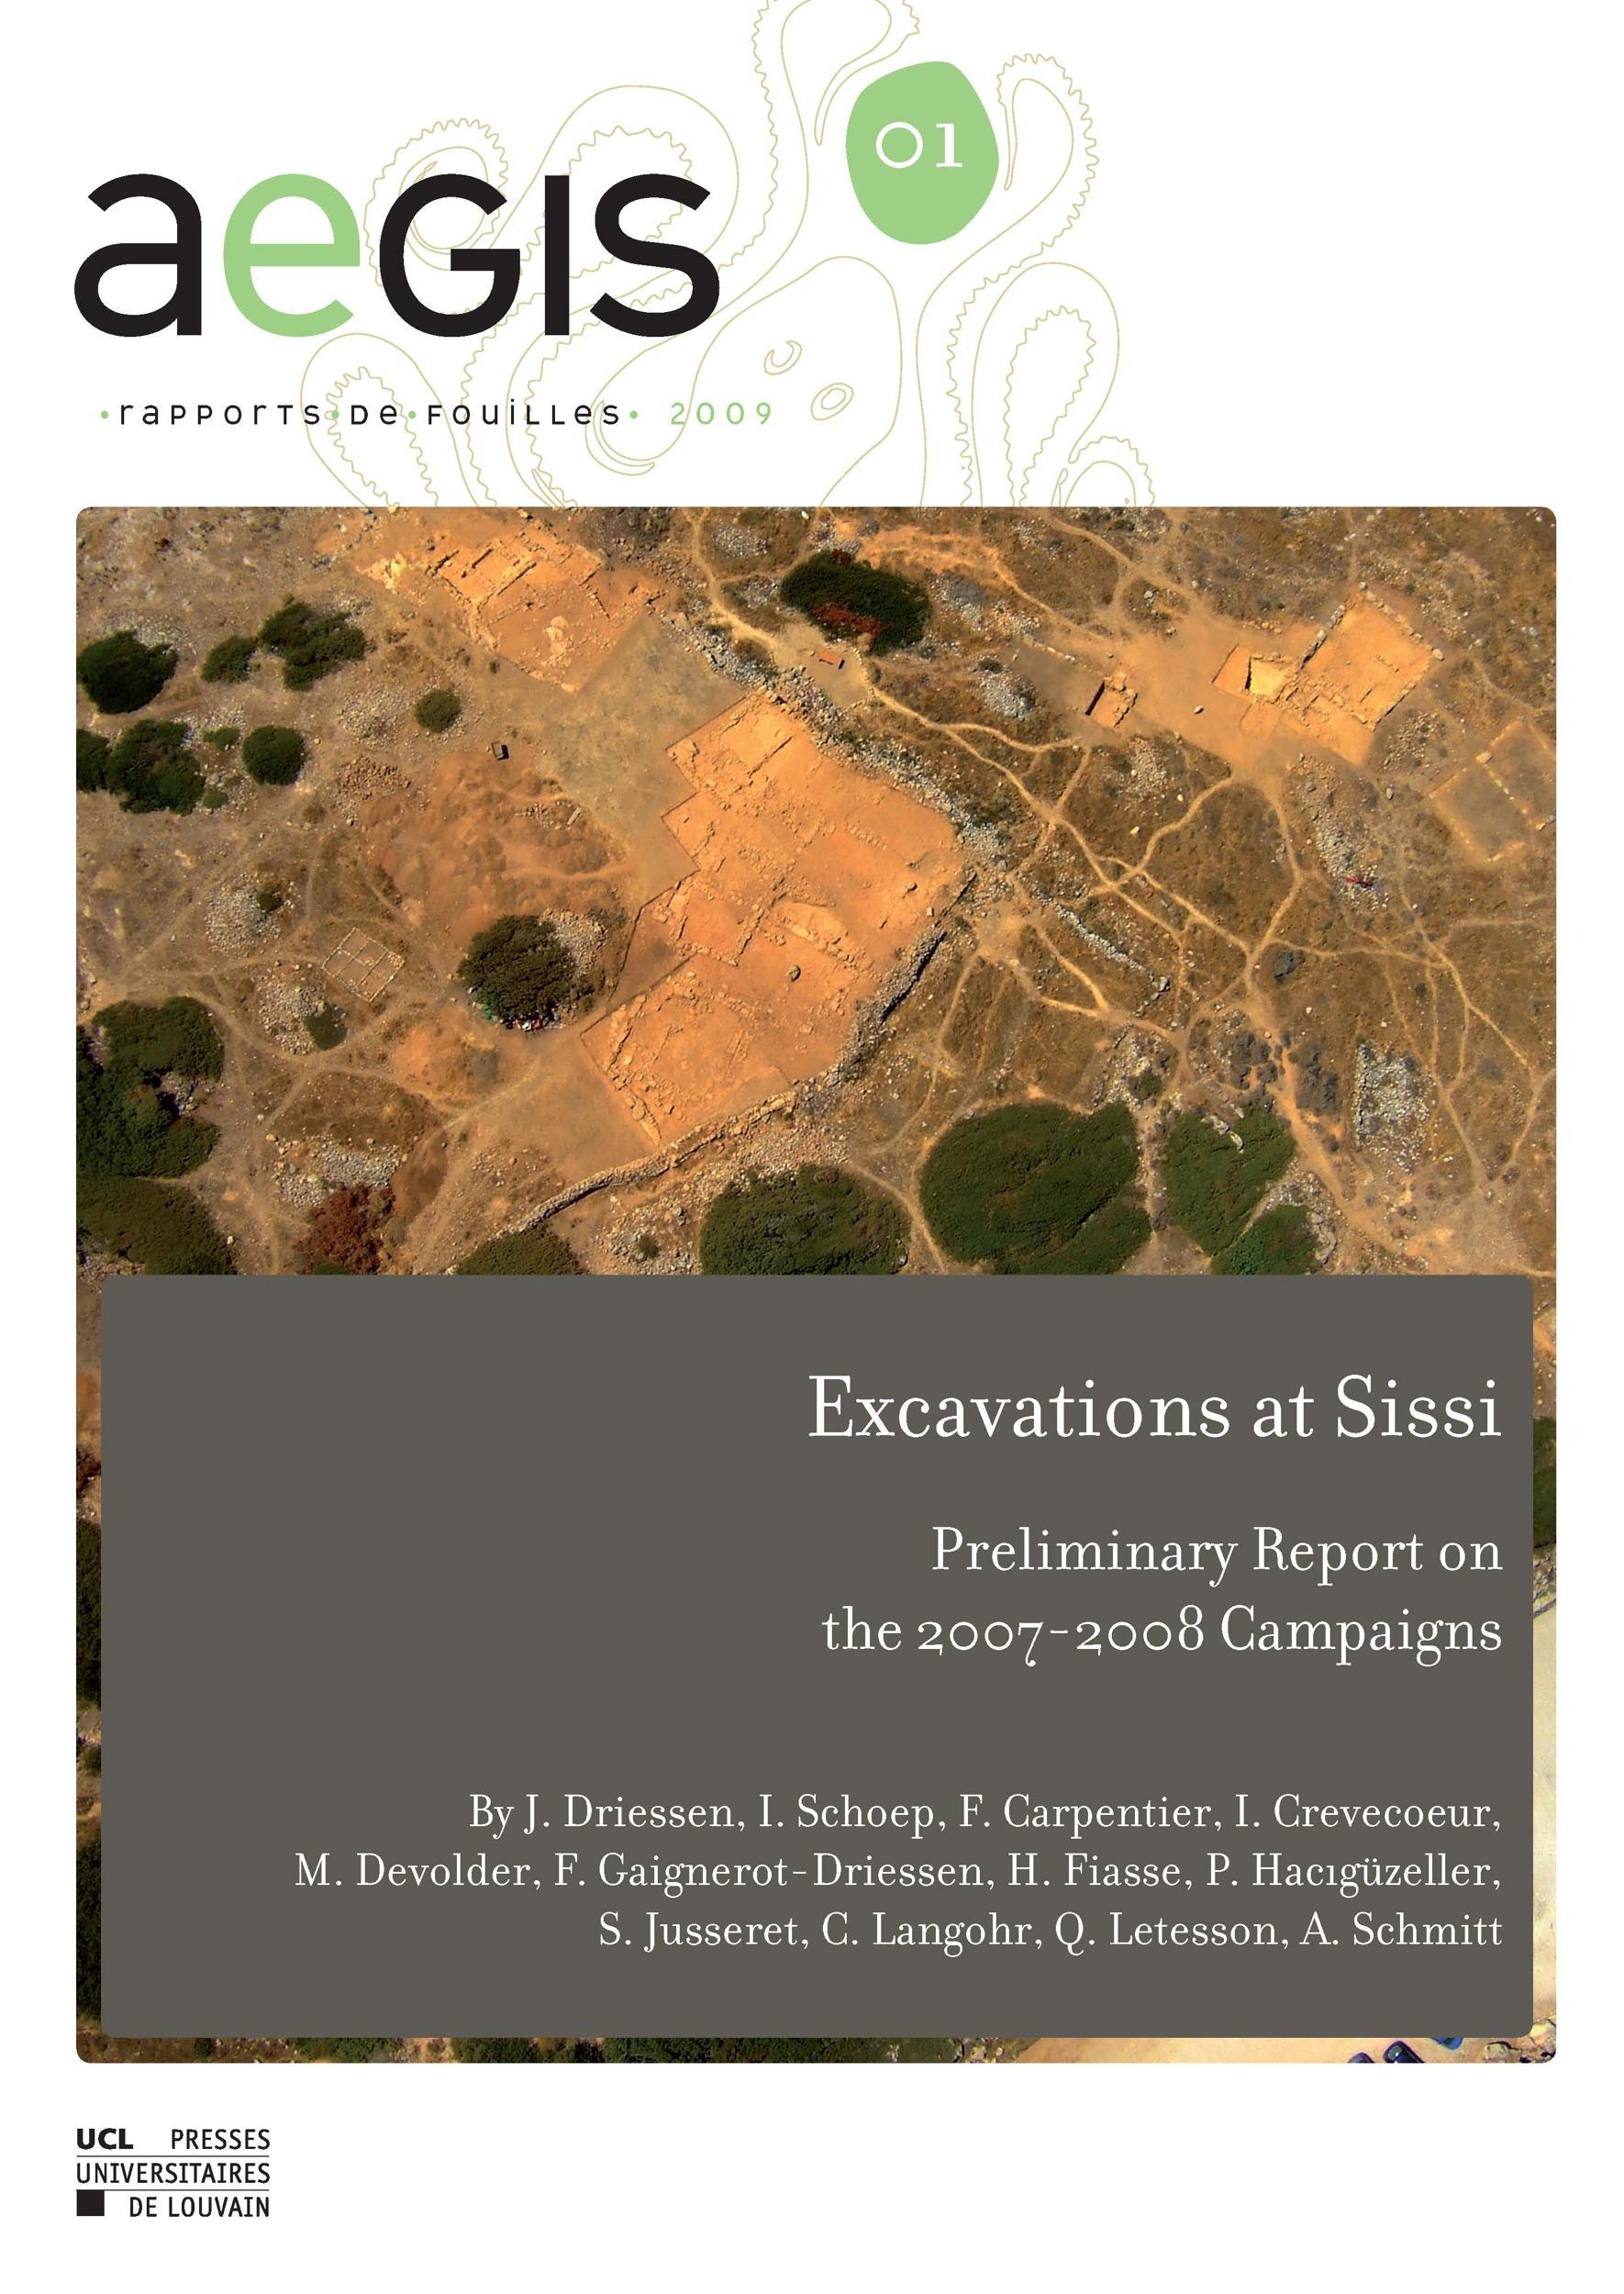 Excavations at Sissi